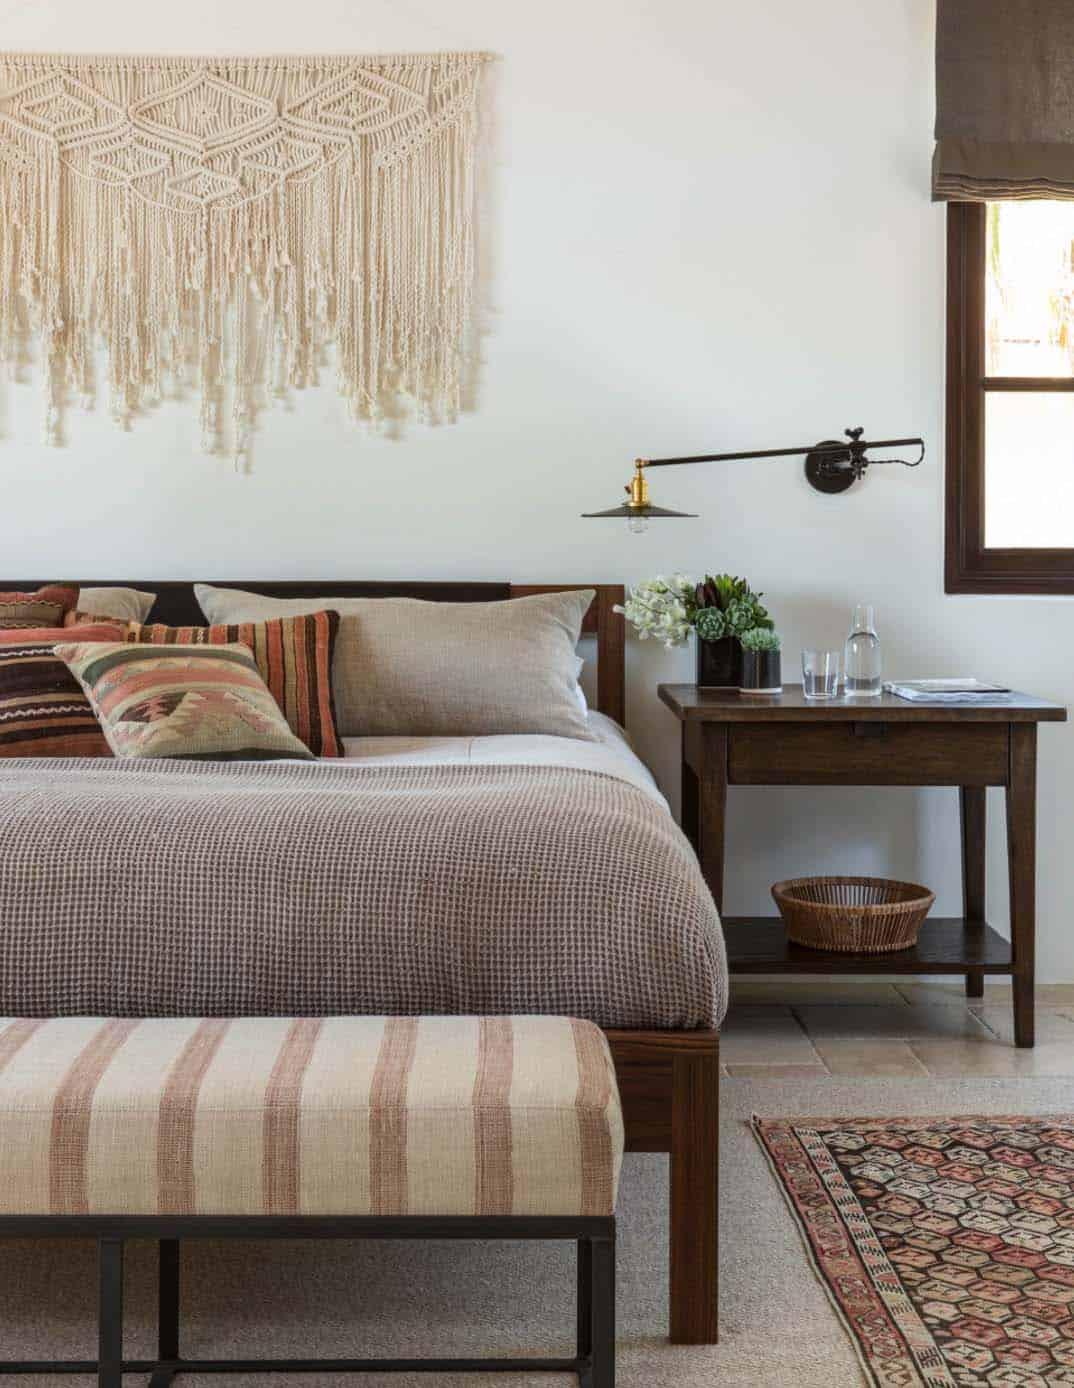 Mediterranean Style Villa-Jute Interior Design-08-1 Kindesign